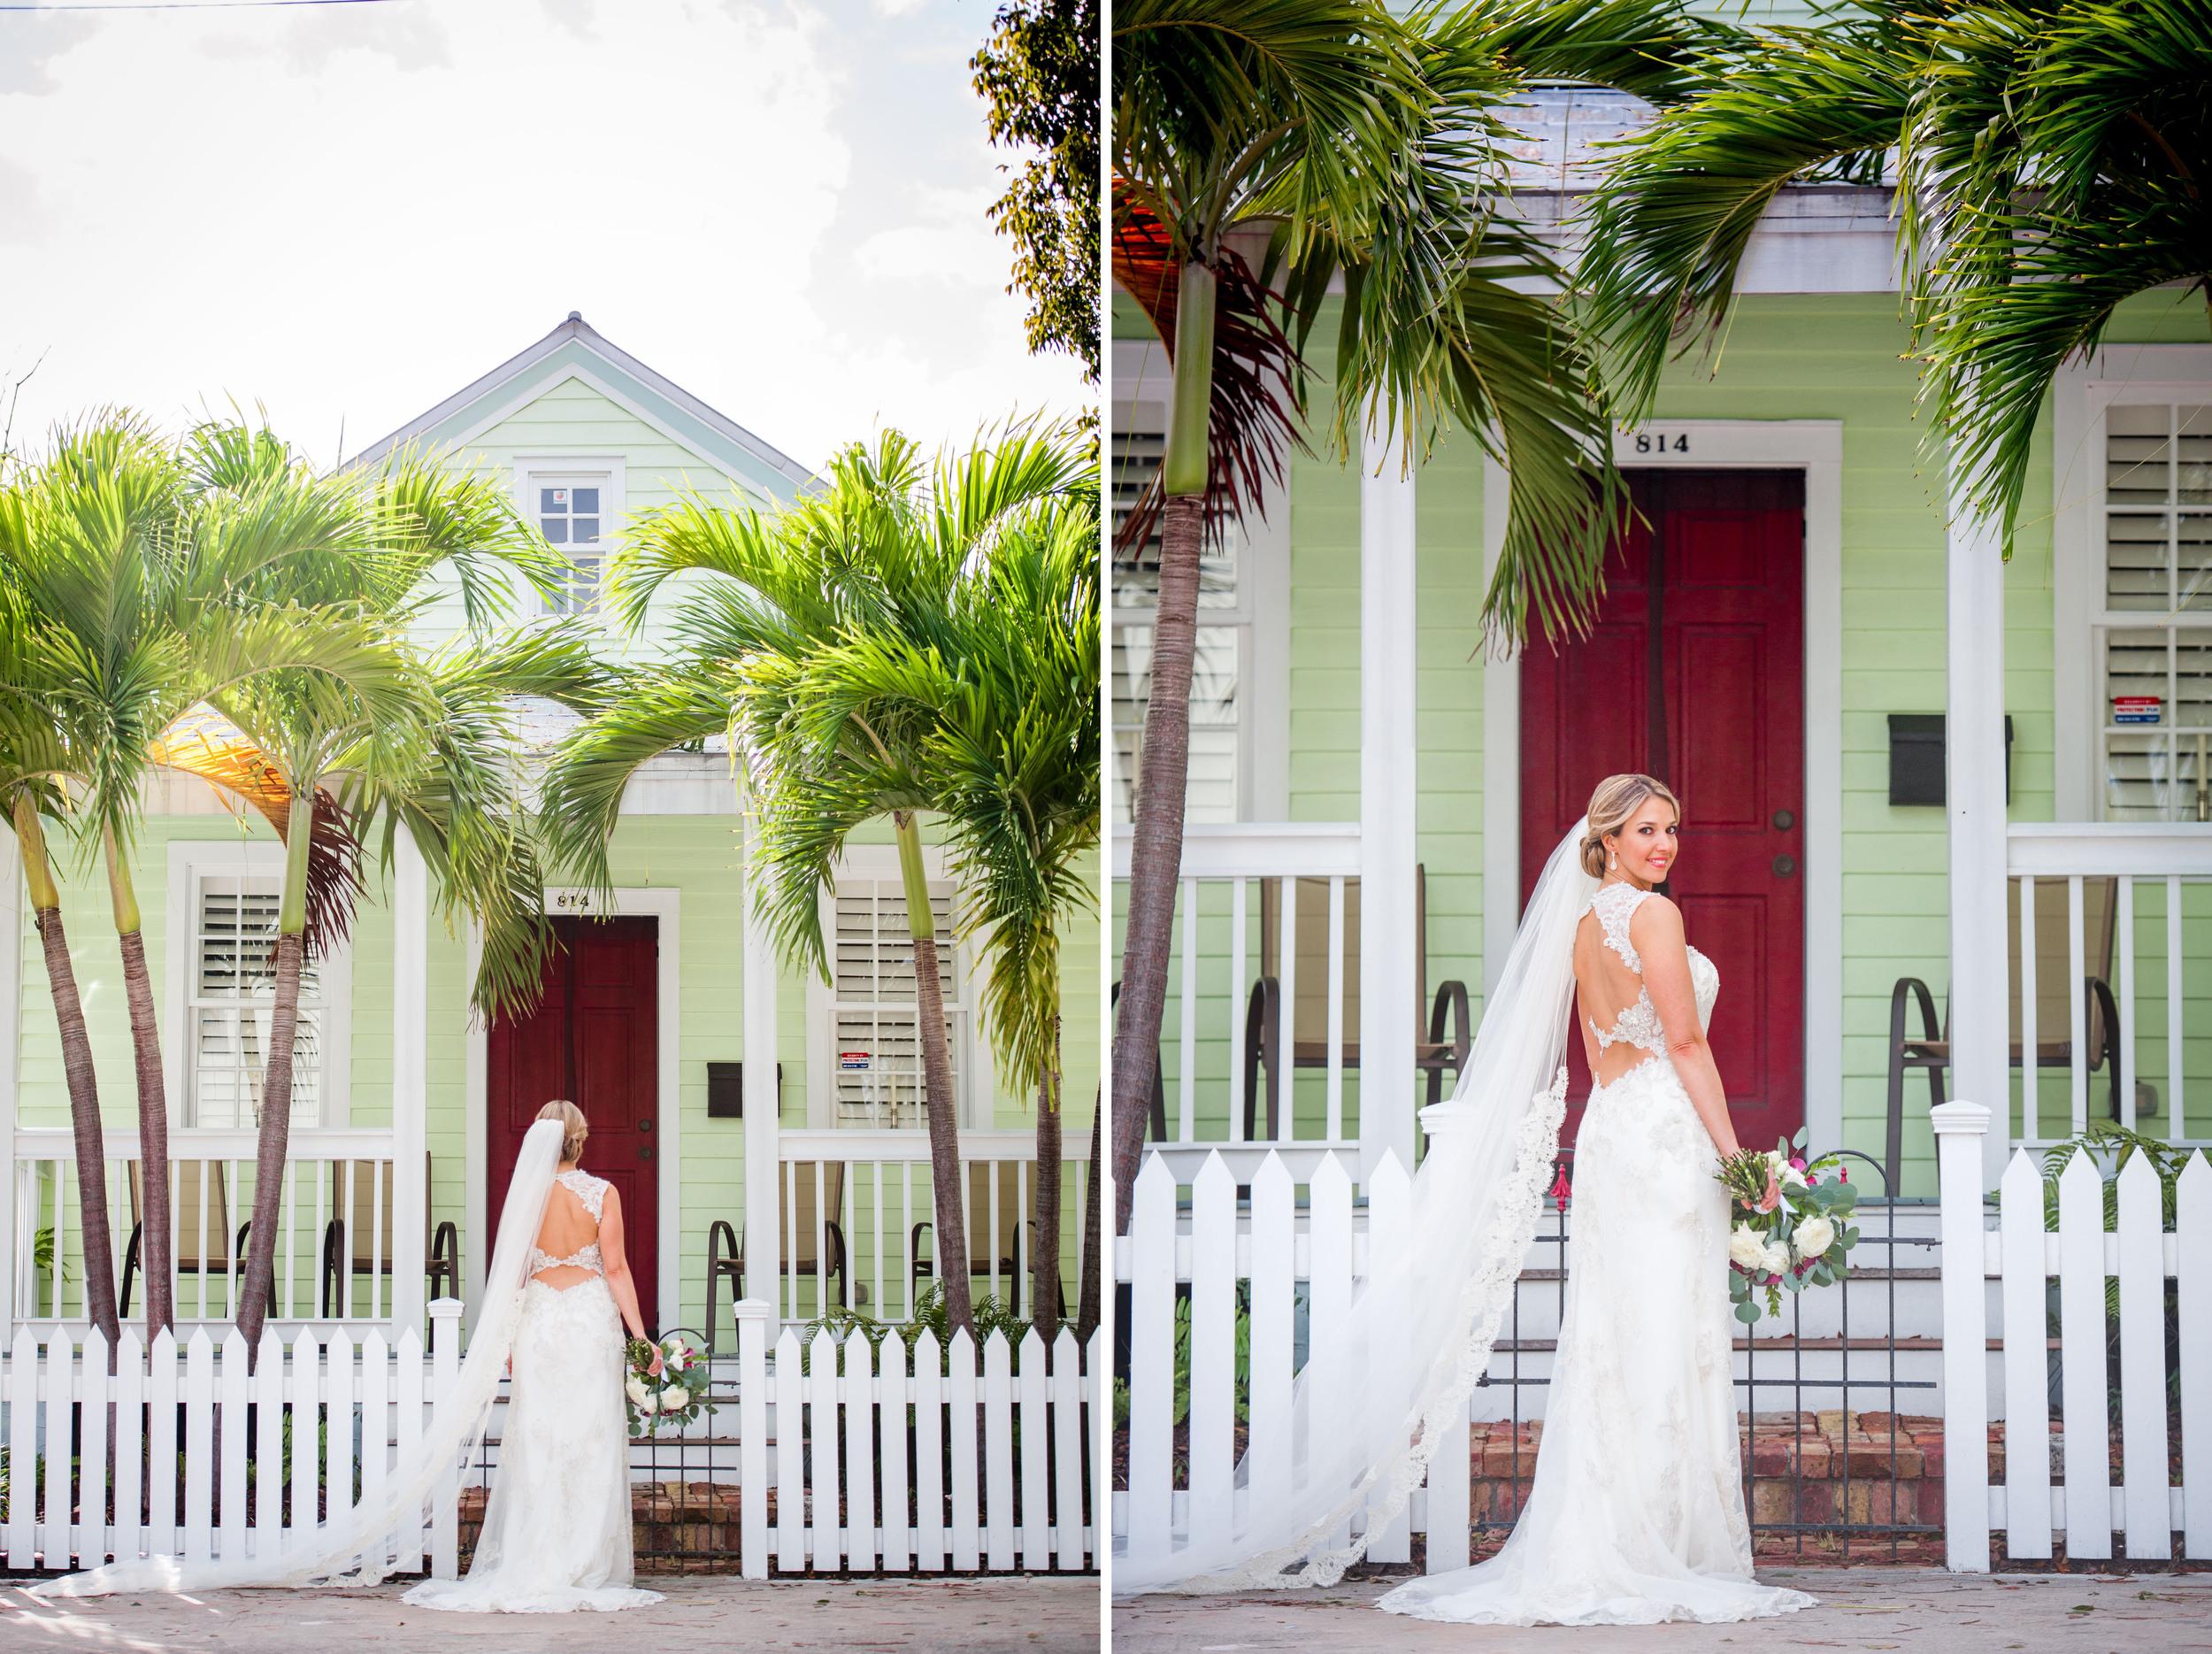 ocean-key-resort-key-west-wedding-013.jpg